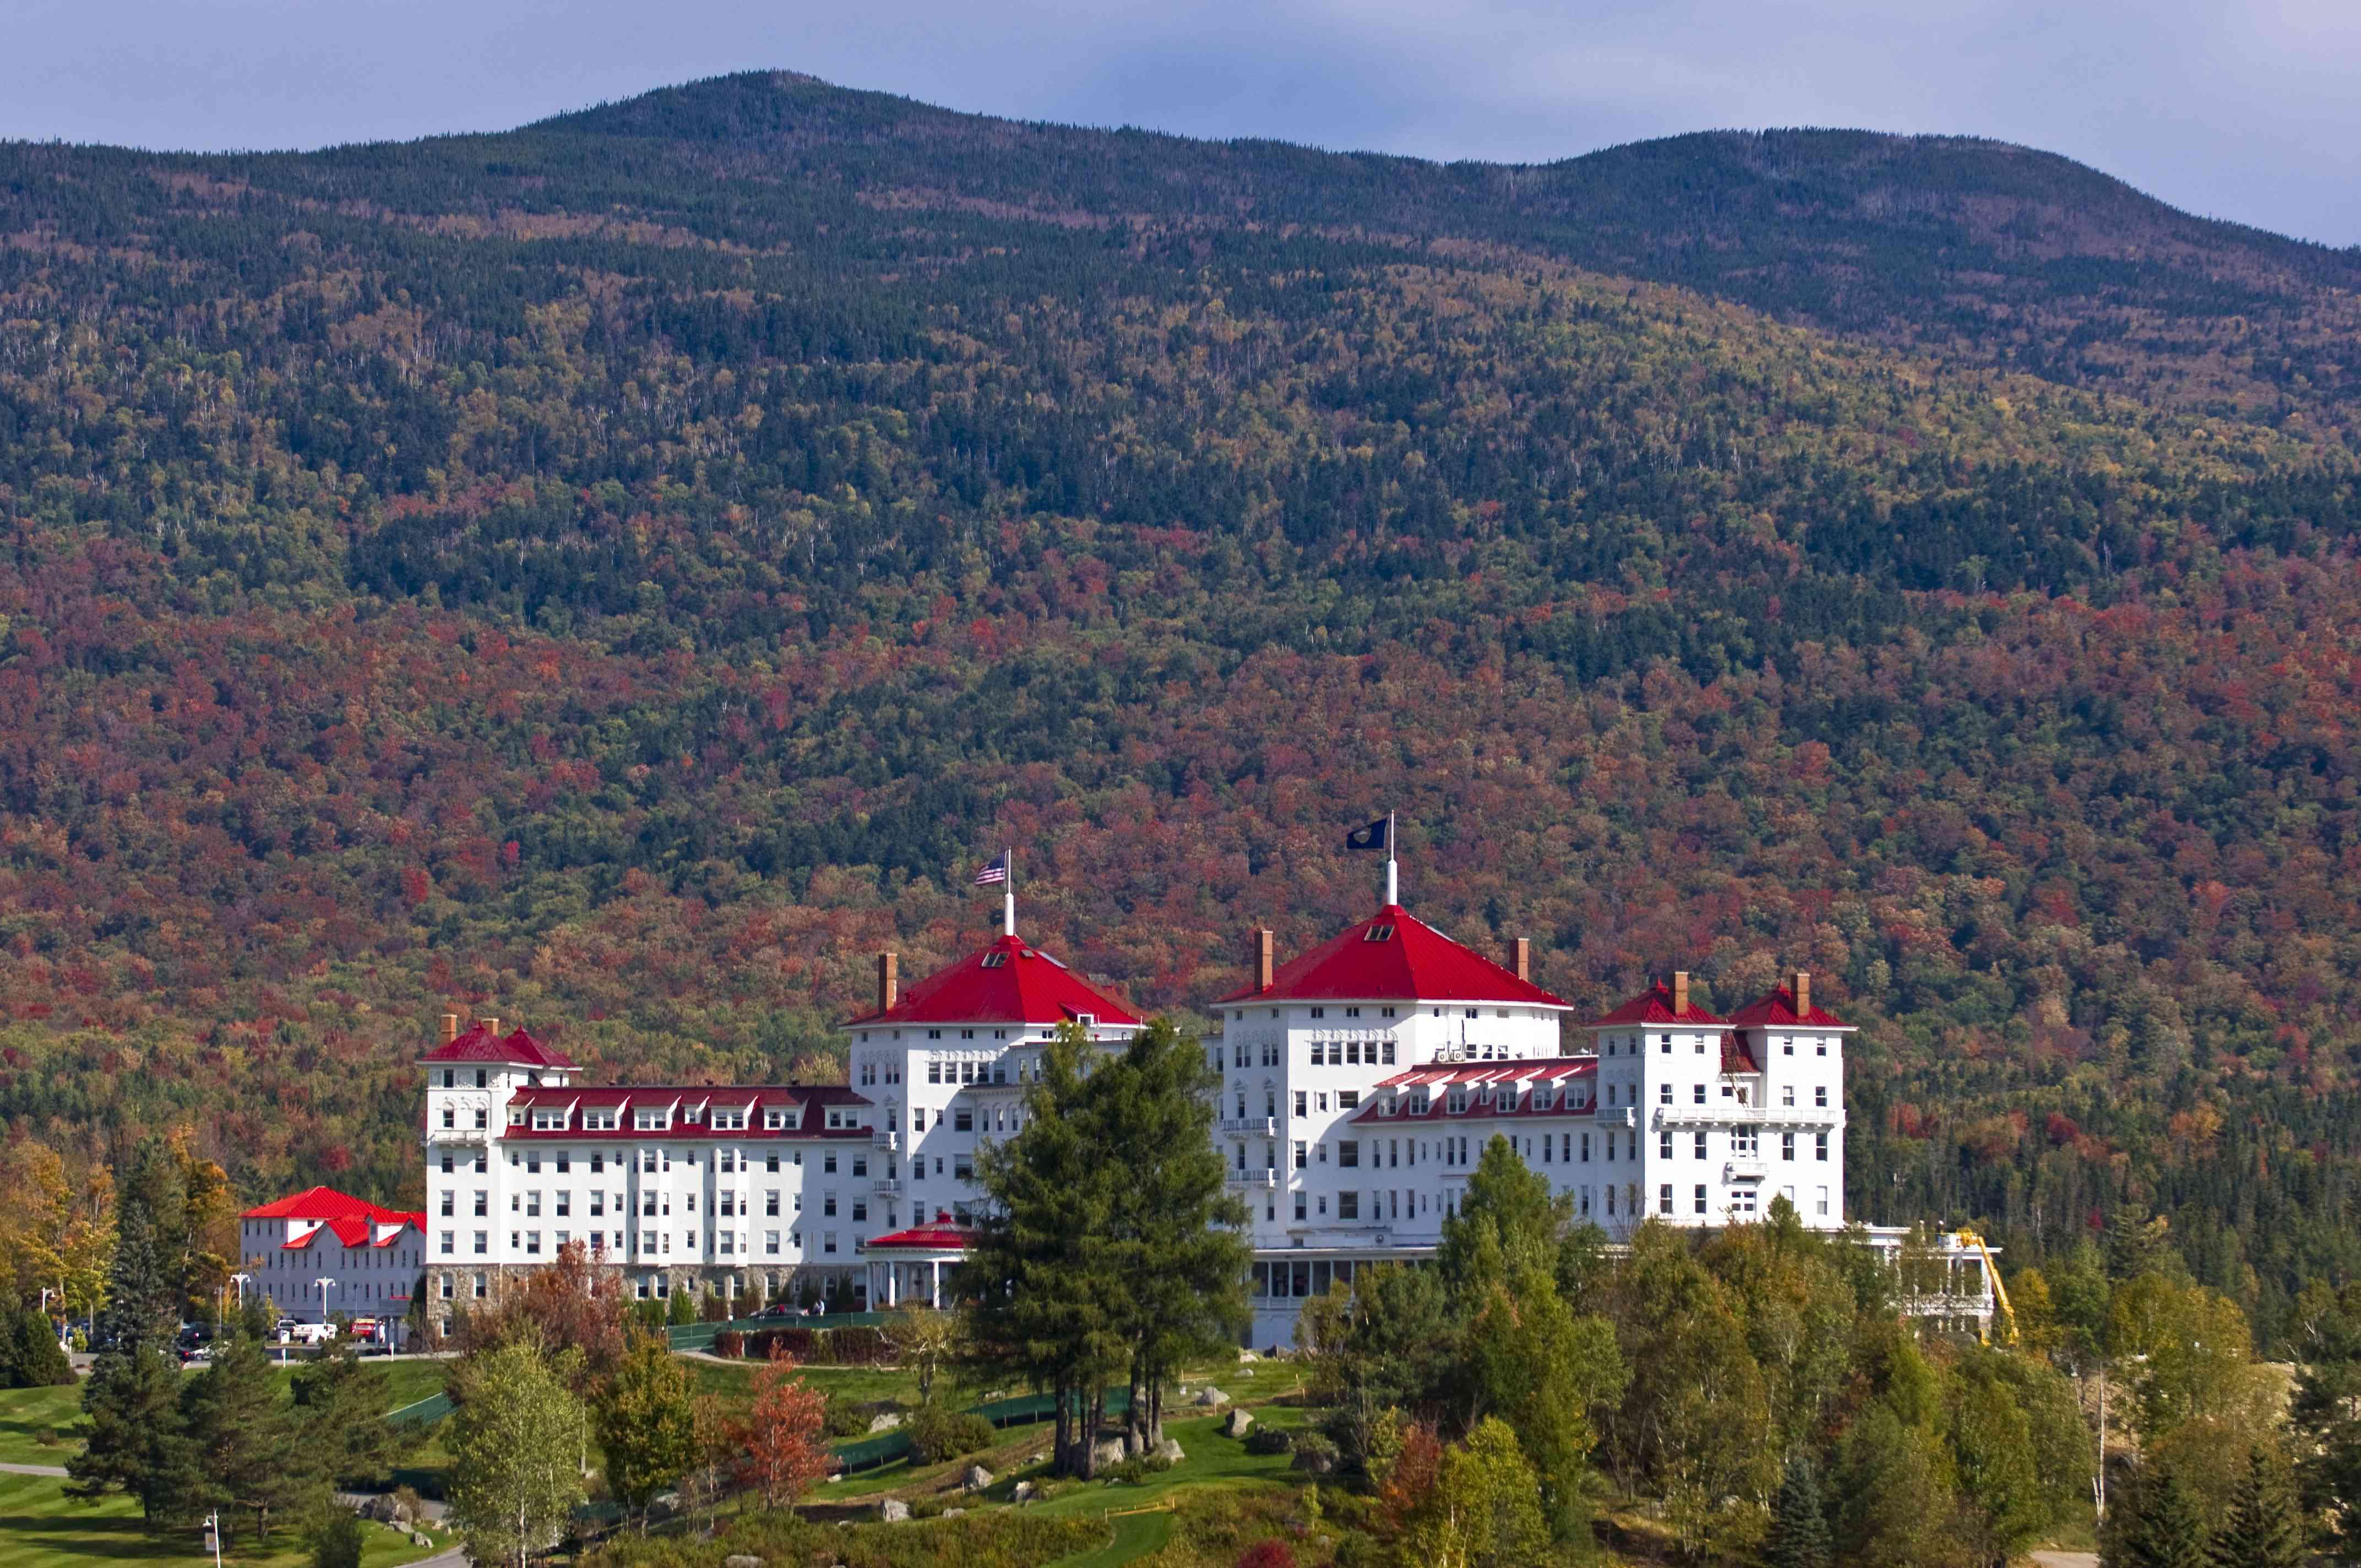 Fall, winter, spring, summer: all stupendous at Omni Mount Washington Resort